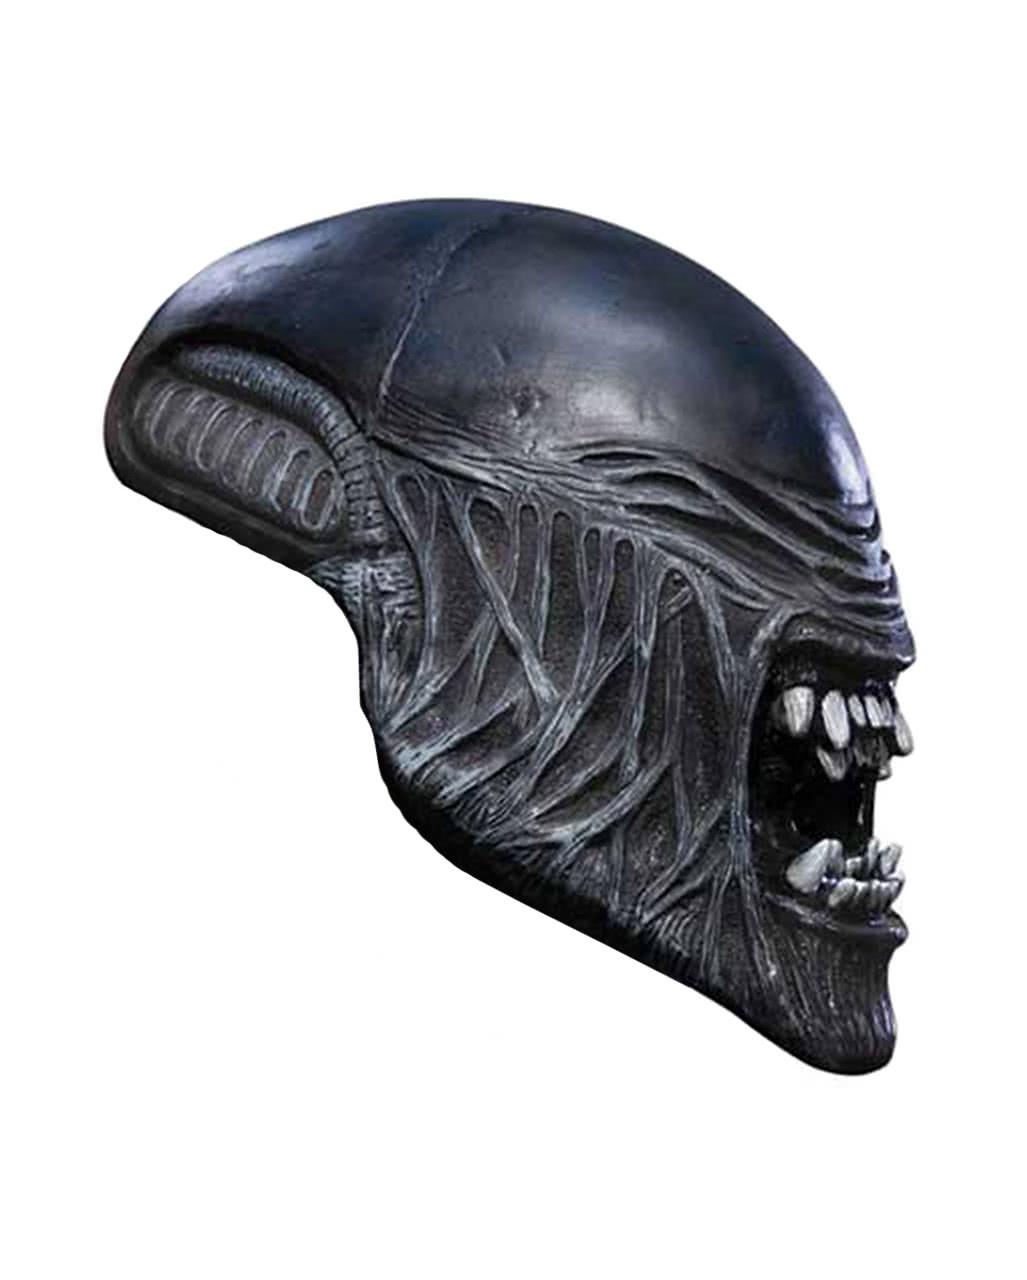 Alien Mask Vinyl Small | Buy Alien Science Fiction Mask | horror ...